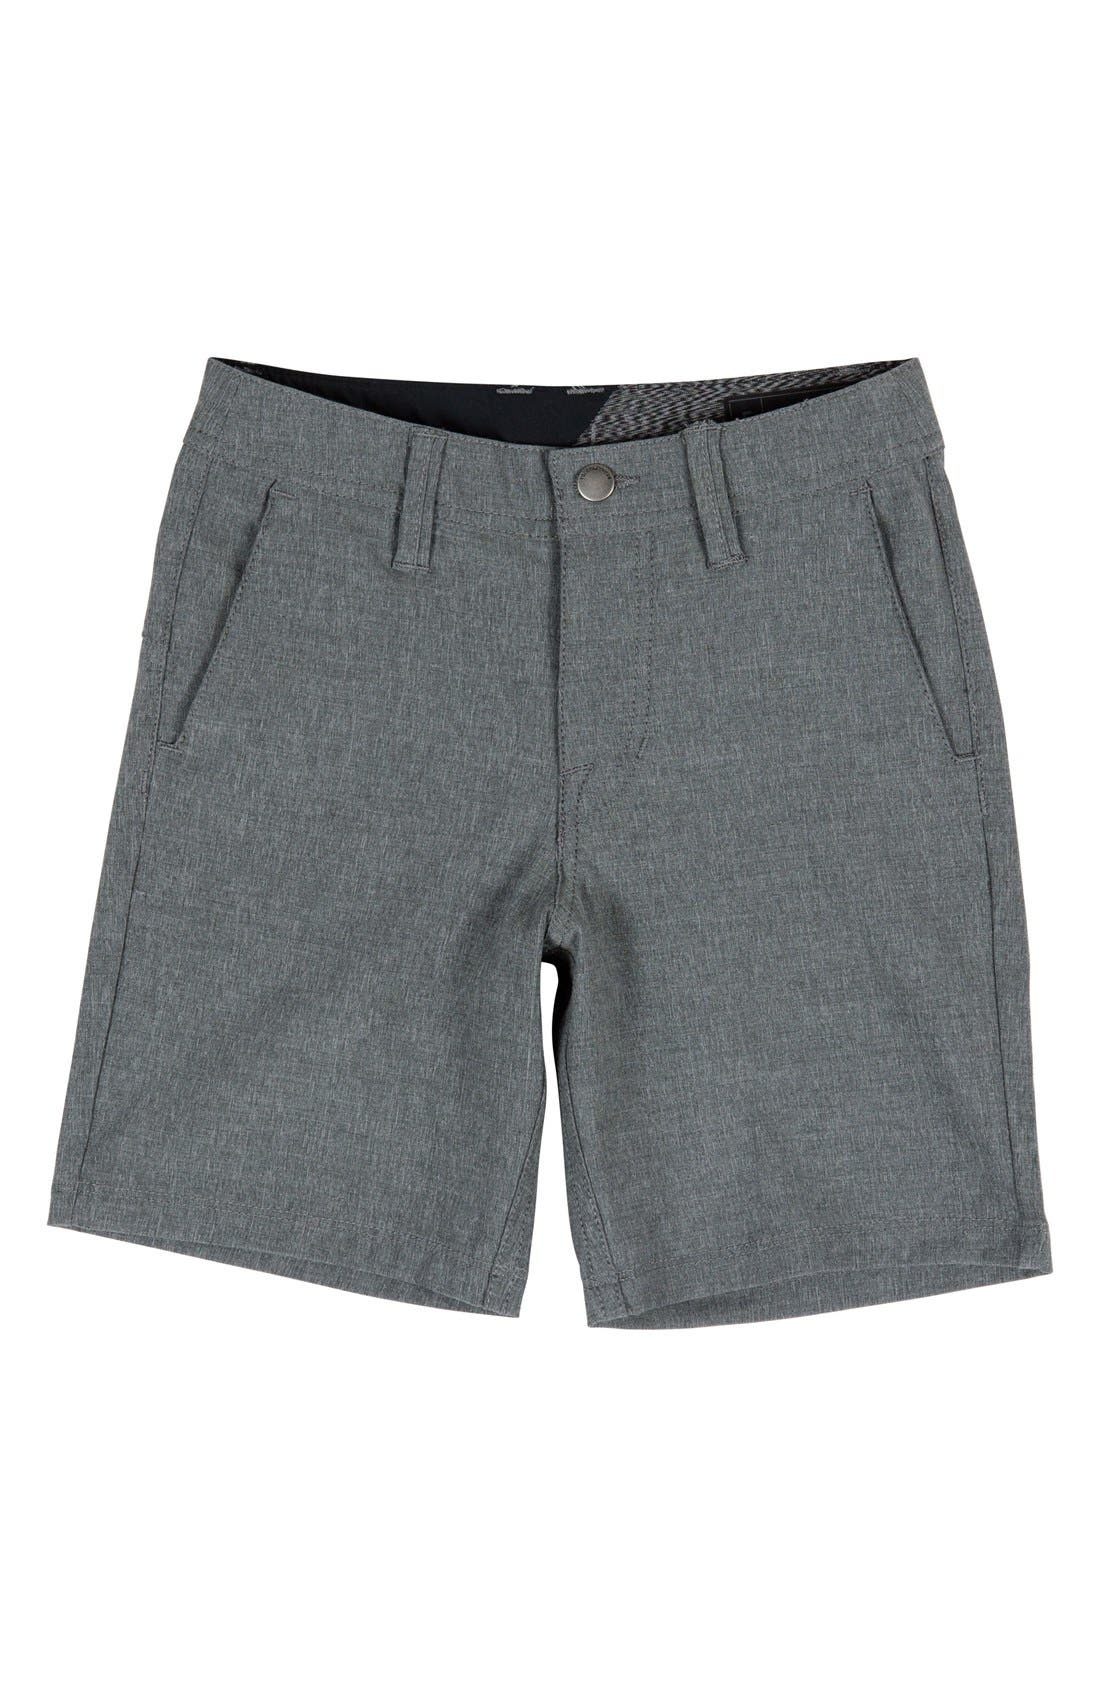 Surf N' Turf Static Hybrid Shorts,                             Main thumbnail 1, color,                             001